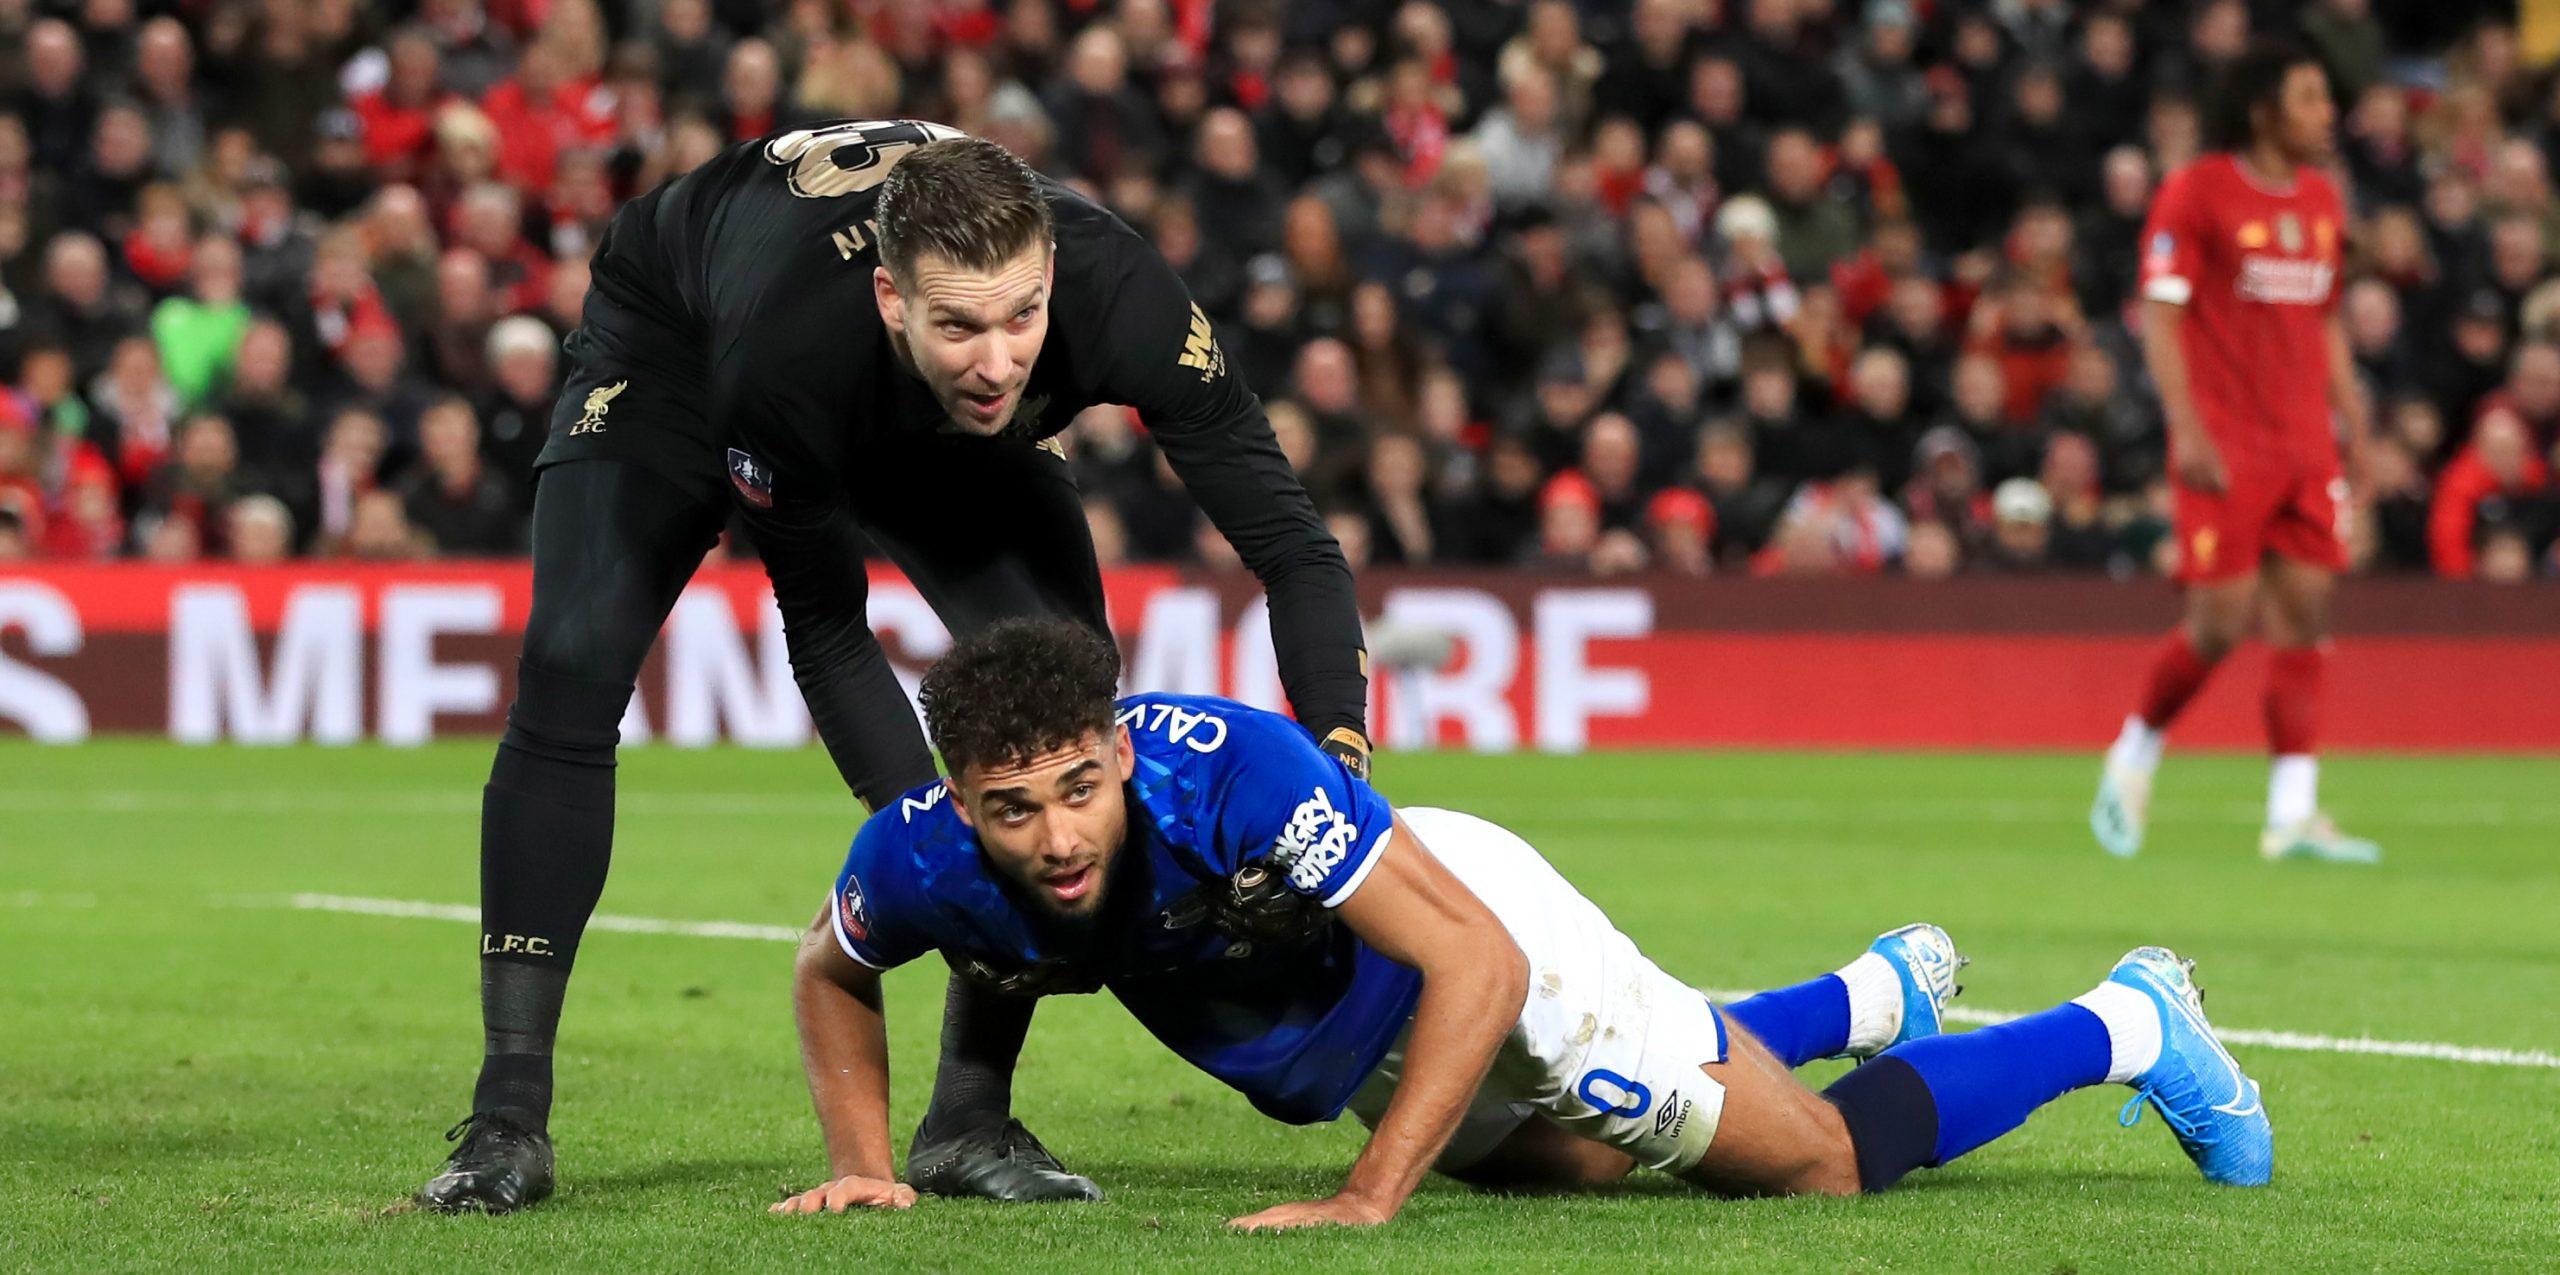 Everton - Dominic Calvert-Lewin